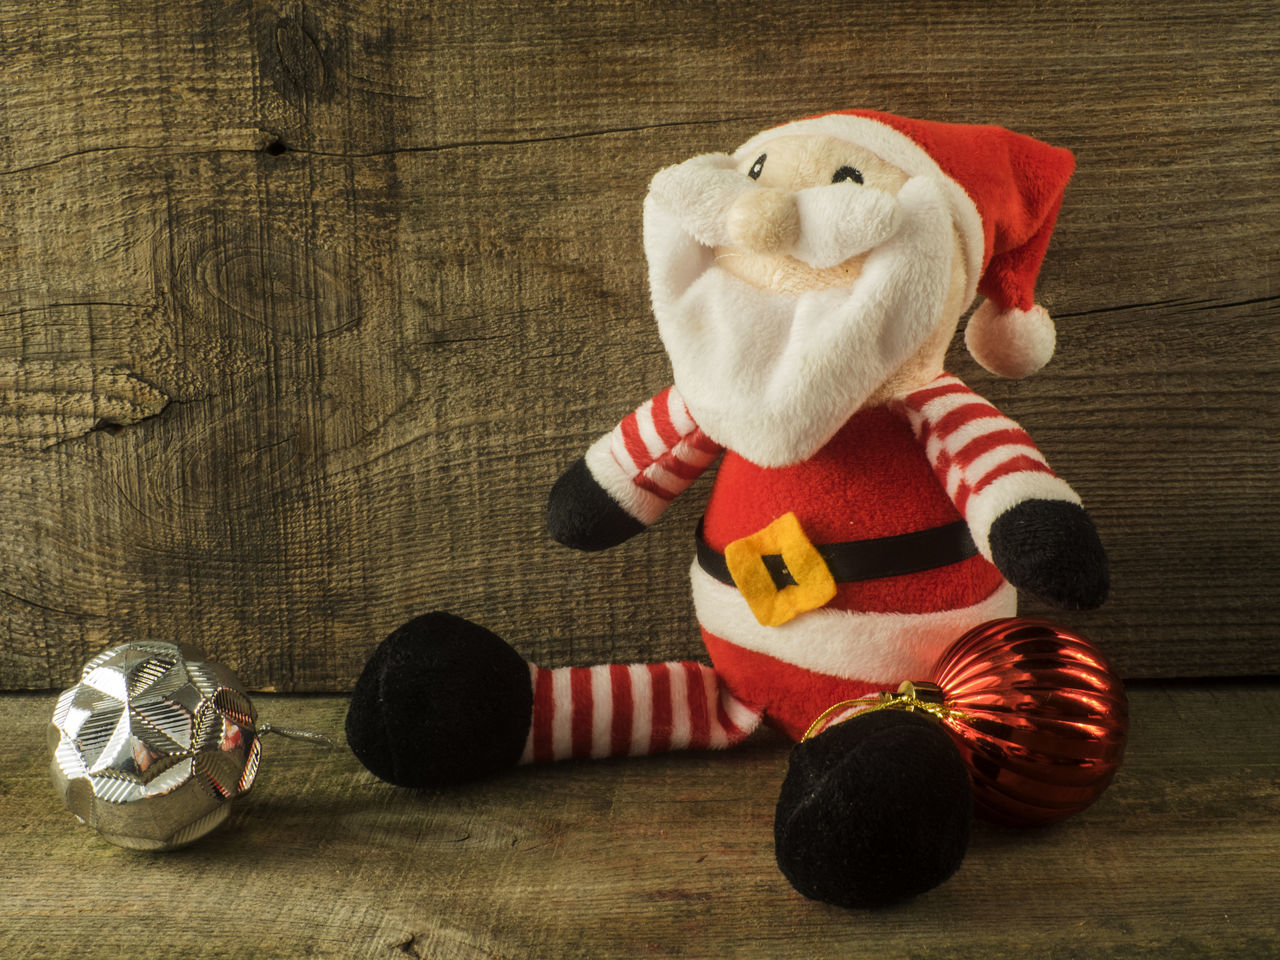 Beautiful stock photos of weihnachtsmann, toy, stuffed toy, teddy bear, indoors